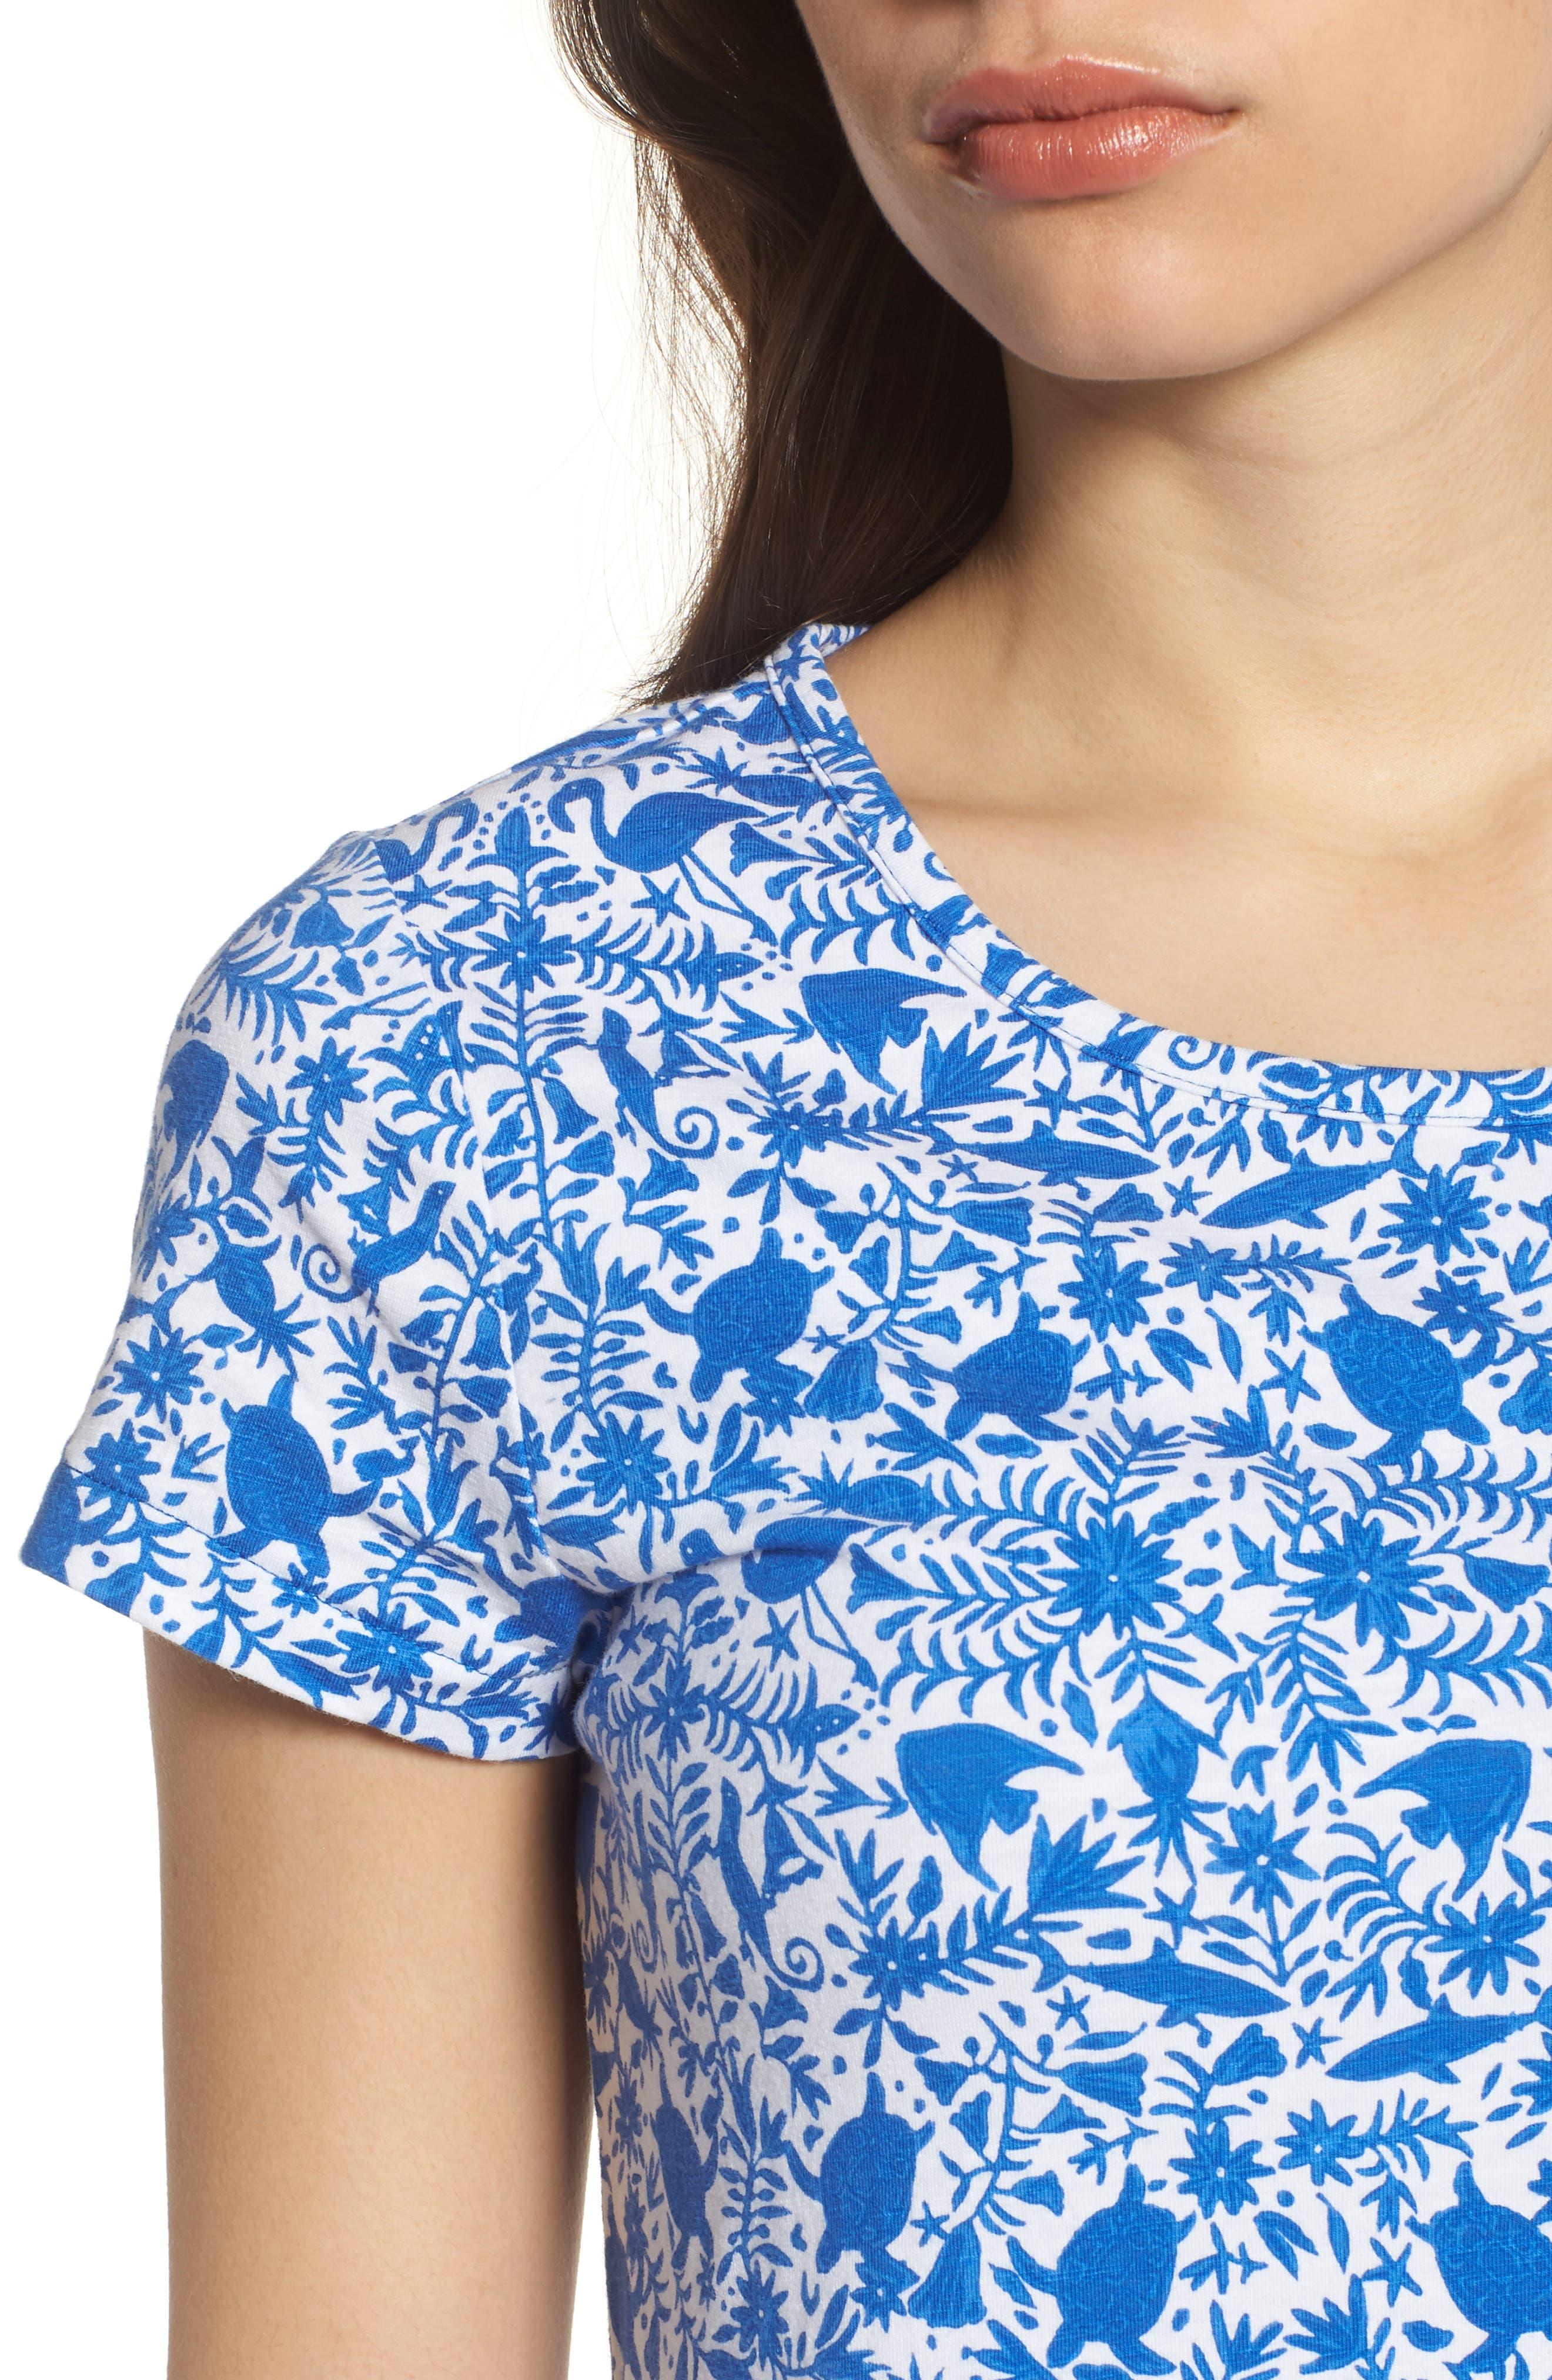 Bahamas Otomi Print Stretch Cotton Dress,                             Alternate thumbnail 4, color,                             413